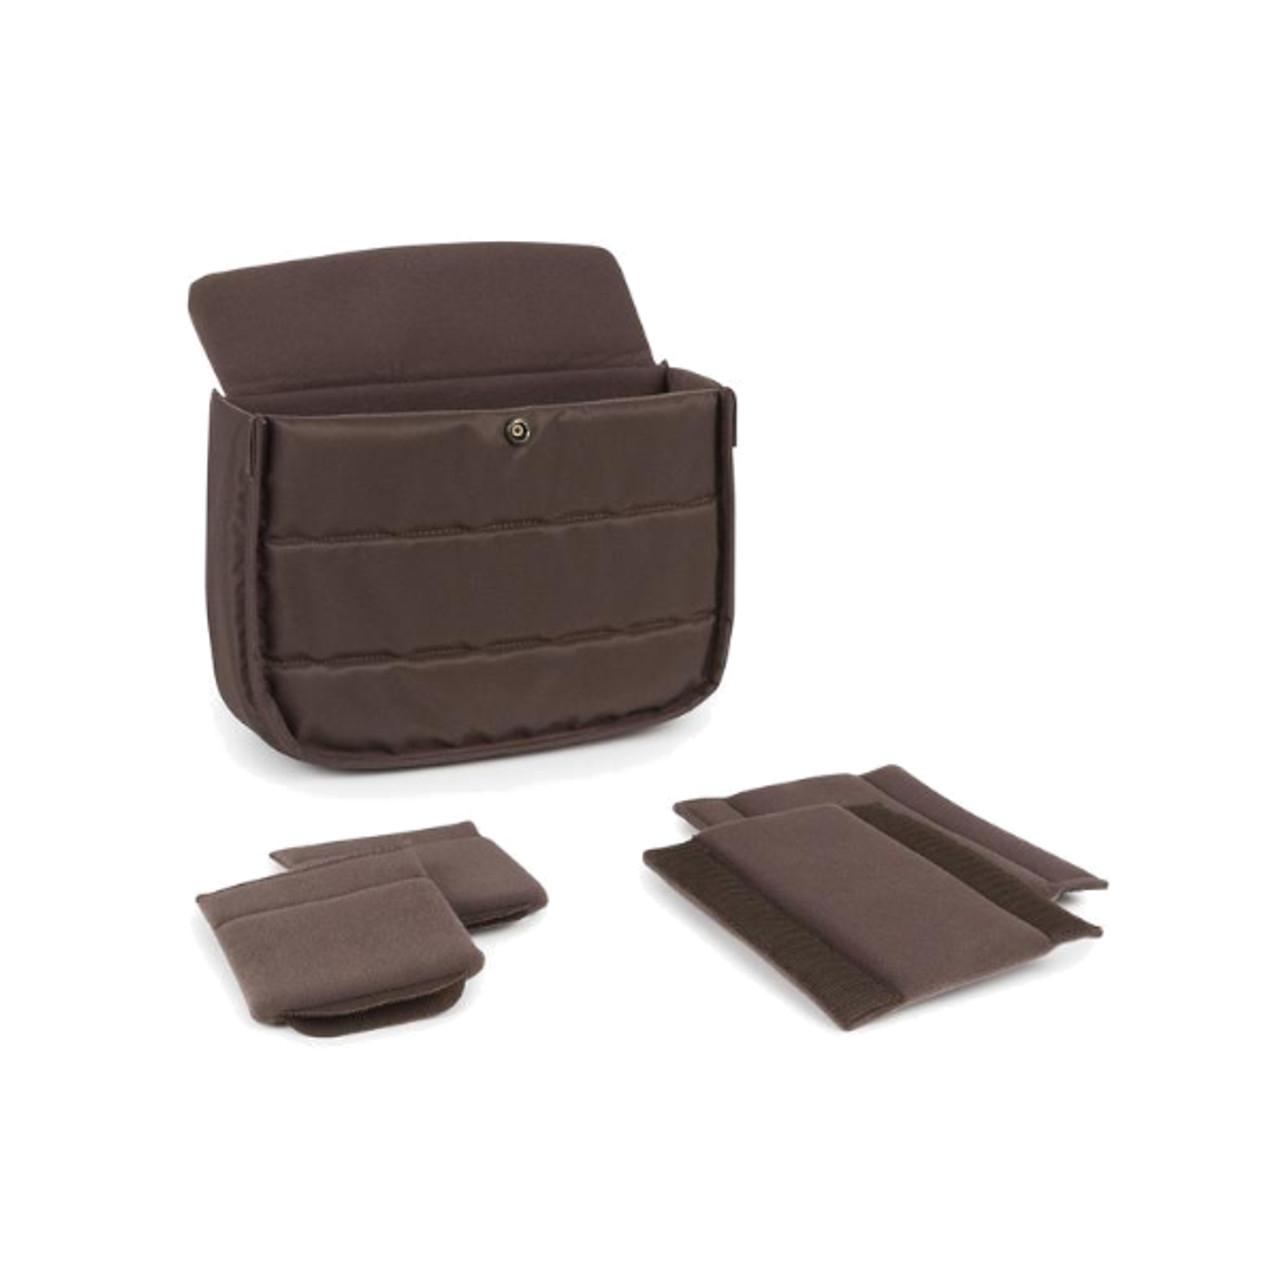 Billingham Hadley Small Pro Navy Canvas/Chocolate Leather